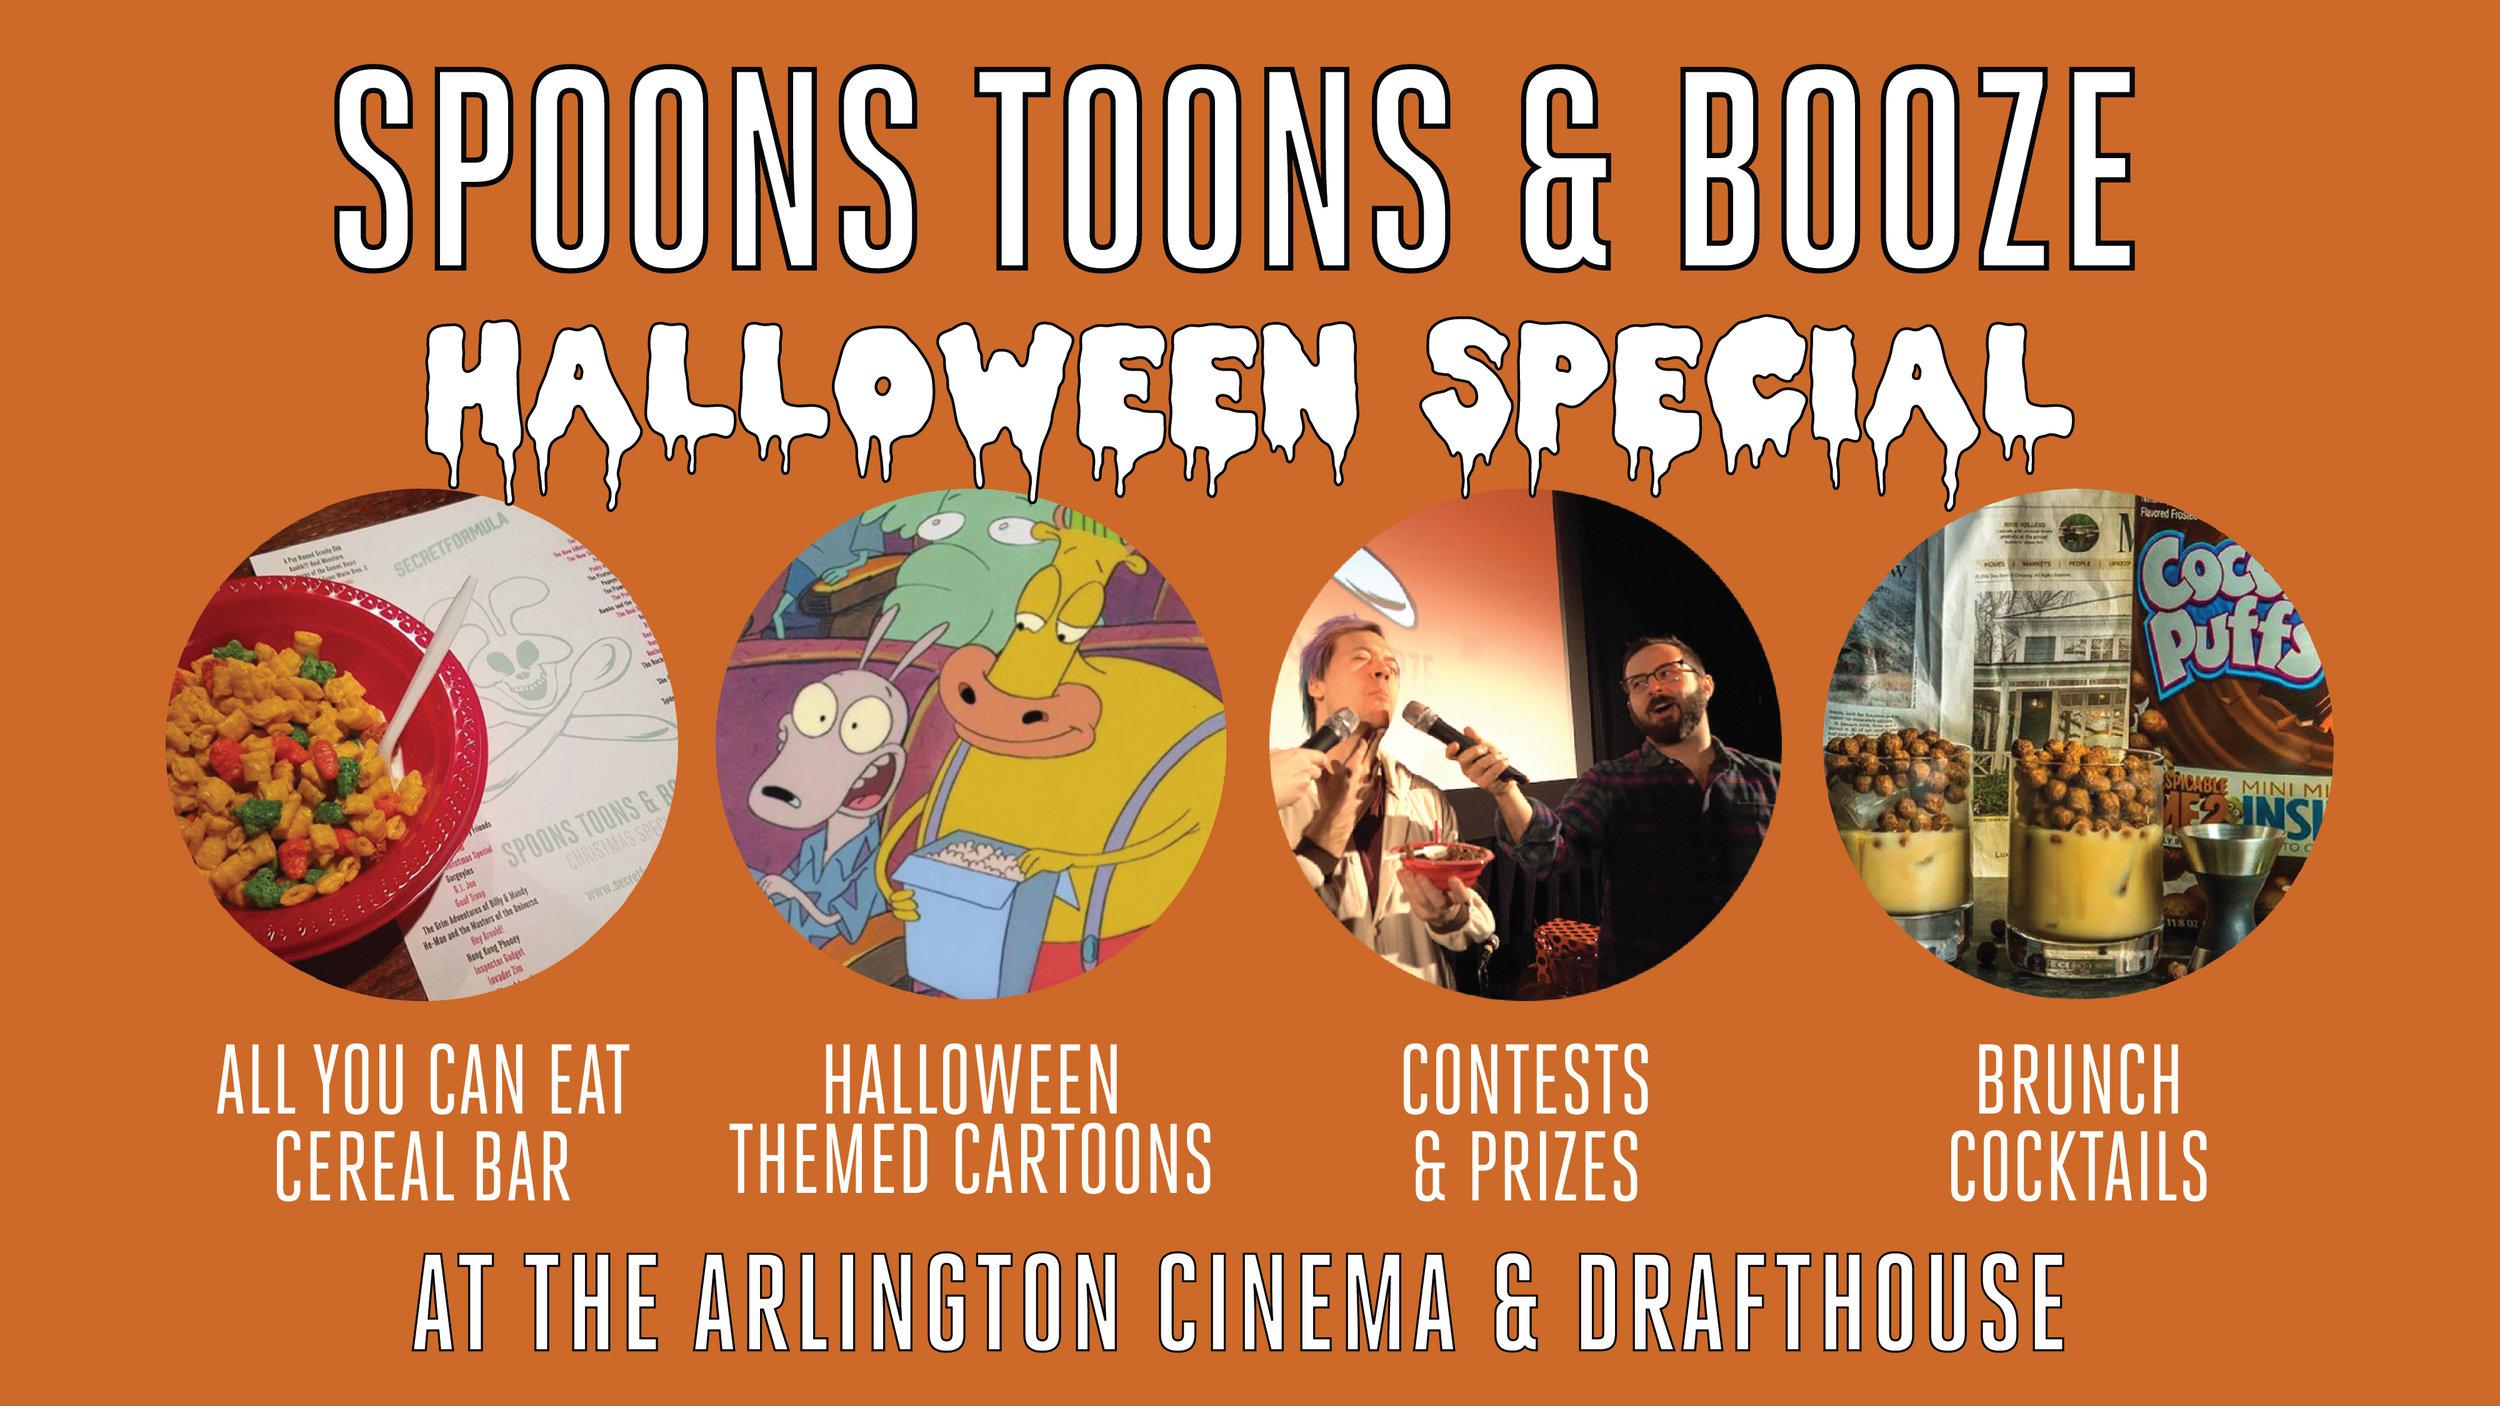 STB ARLINGTON Facebook Banner Halloween 2018 (1).jpg